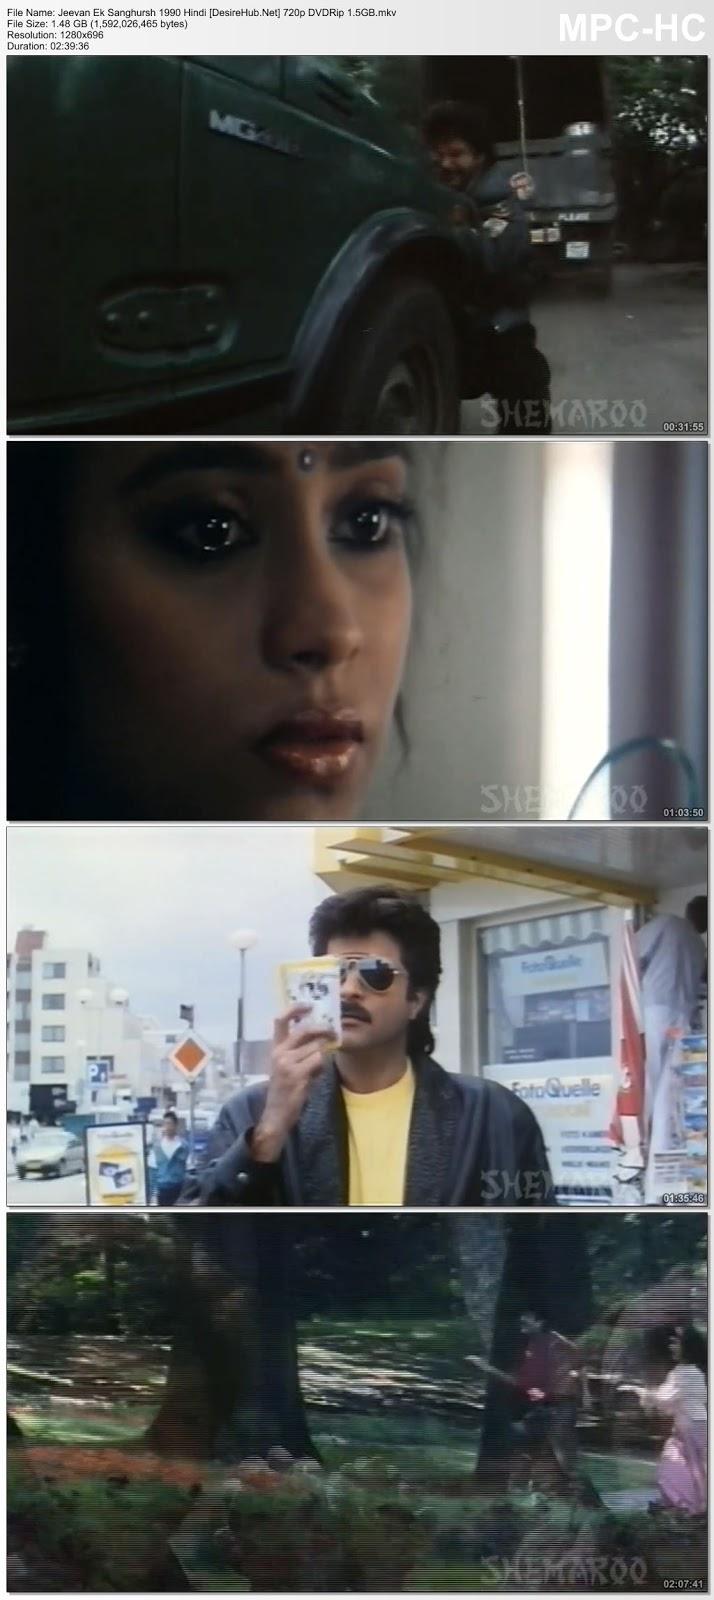 Jeevan Ek Sanghursh 1990 Hindi 720p DVDRip 1.5GB | MoviesHub